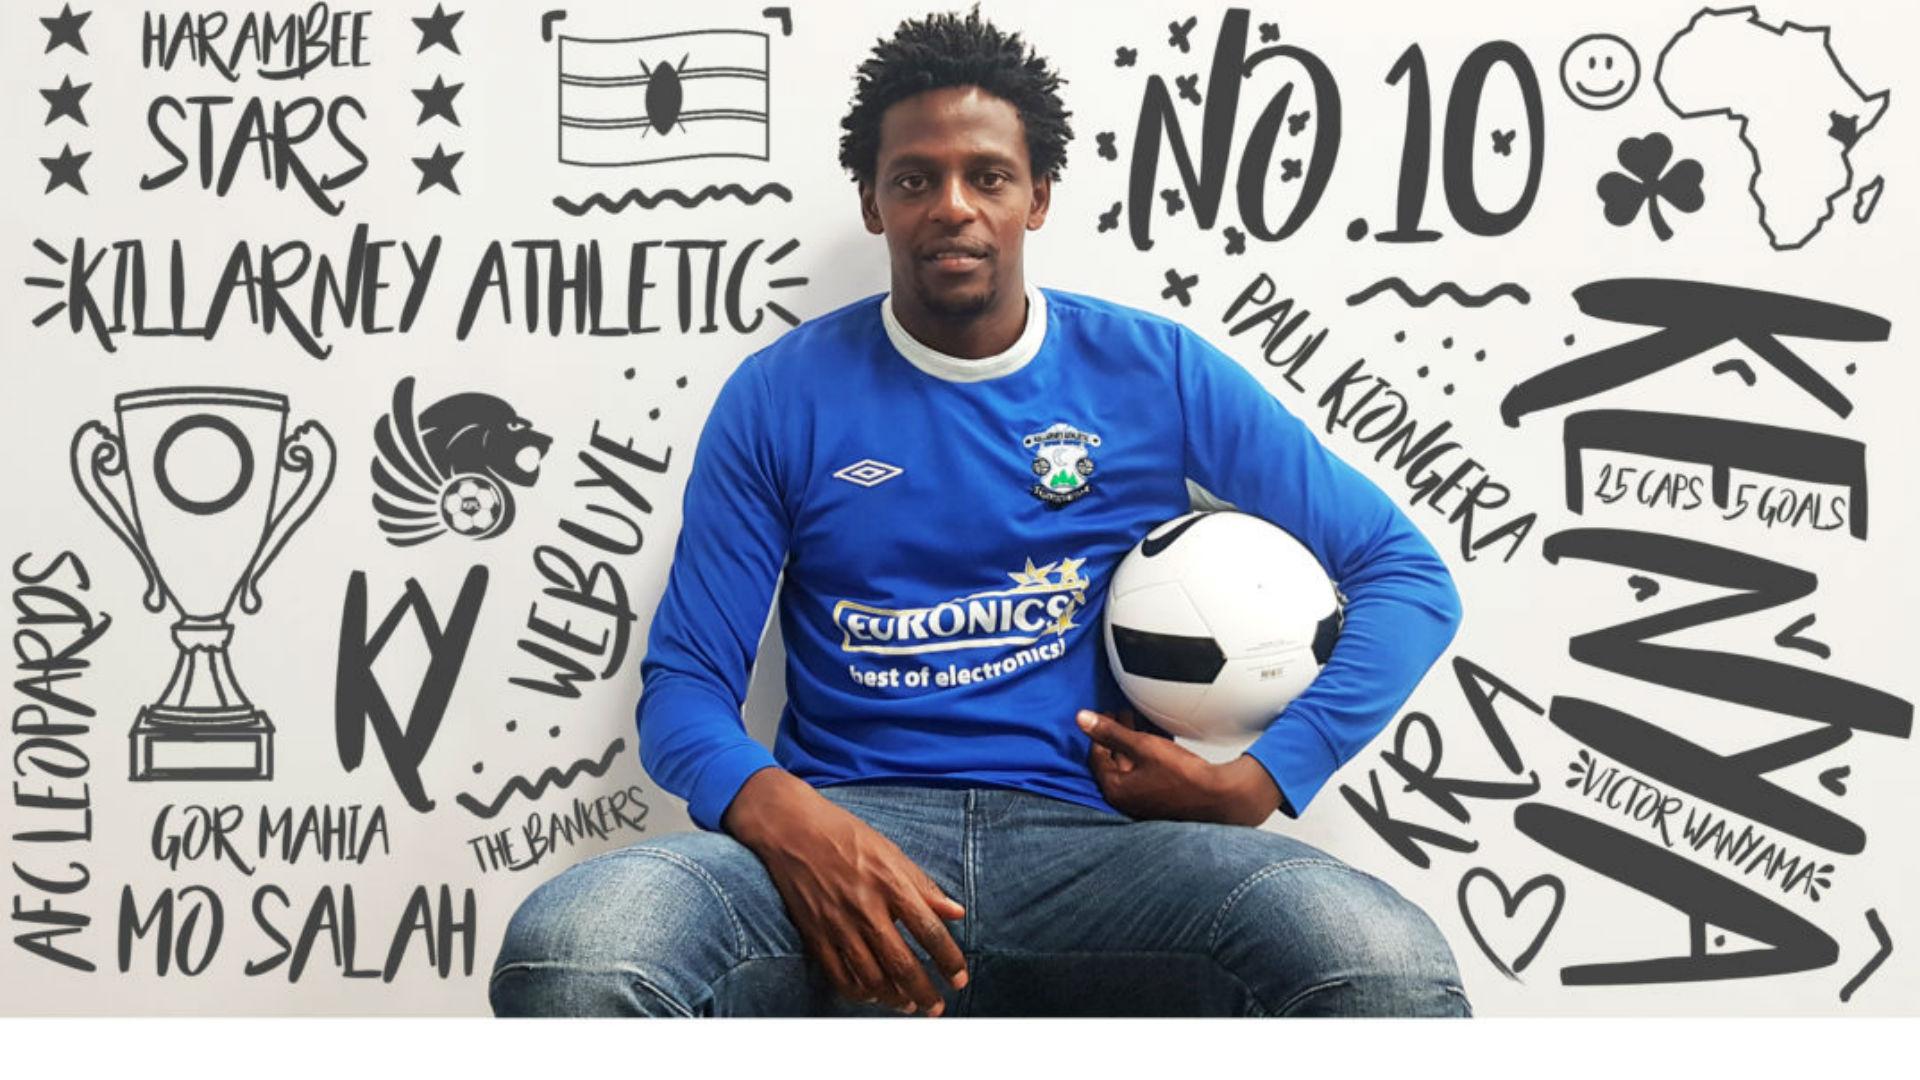 Paul Kiongera: Killarney Athletic sign former Gor Mahia striker